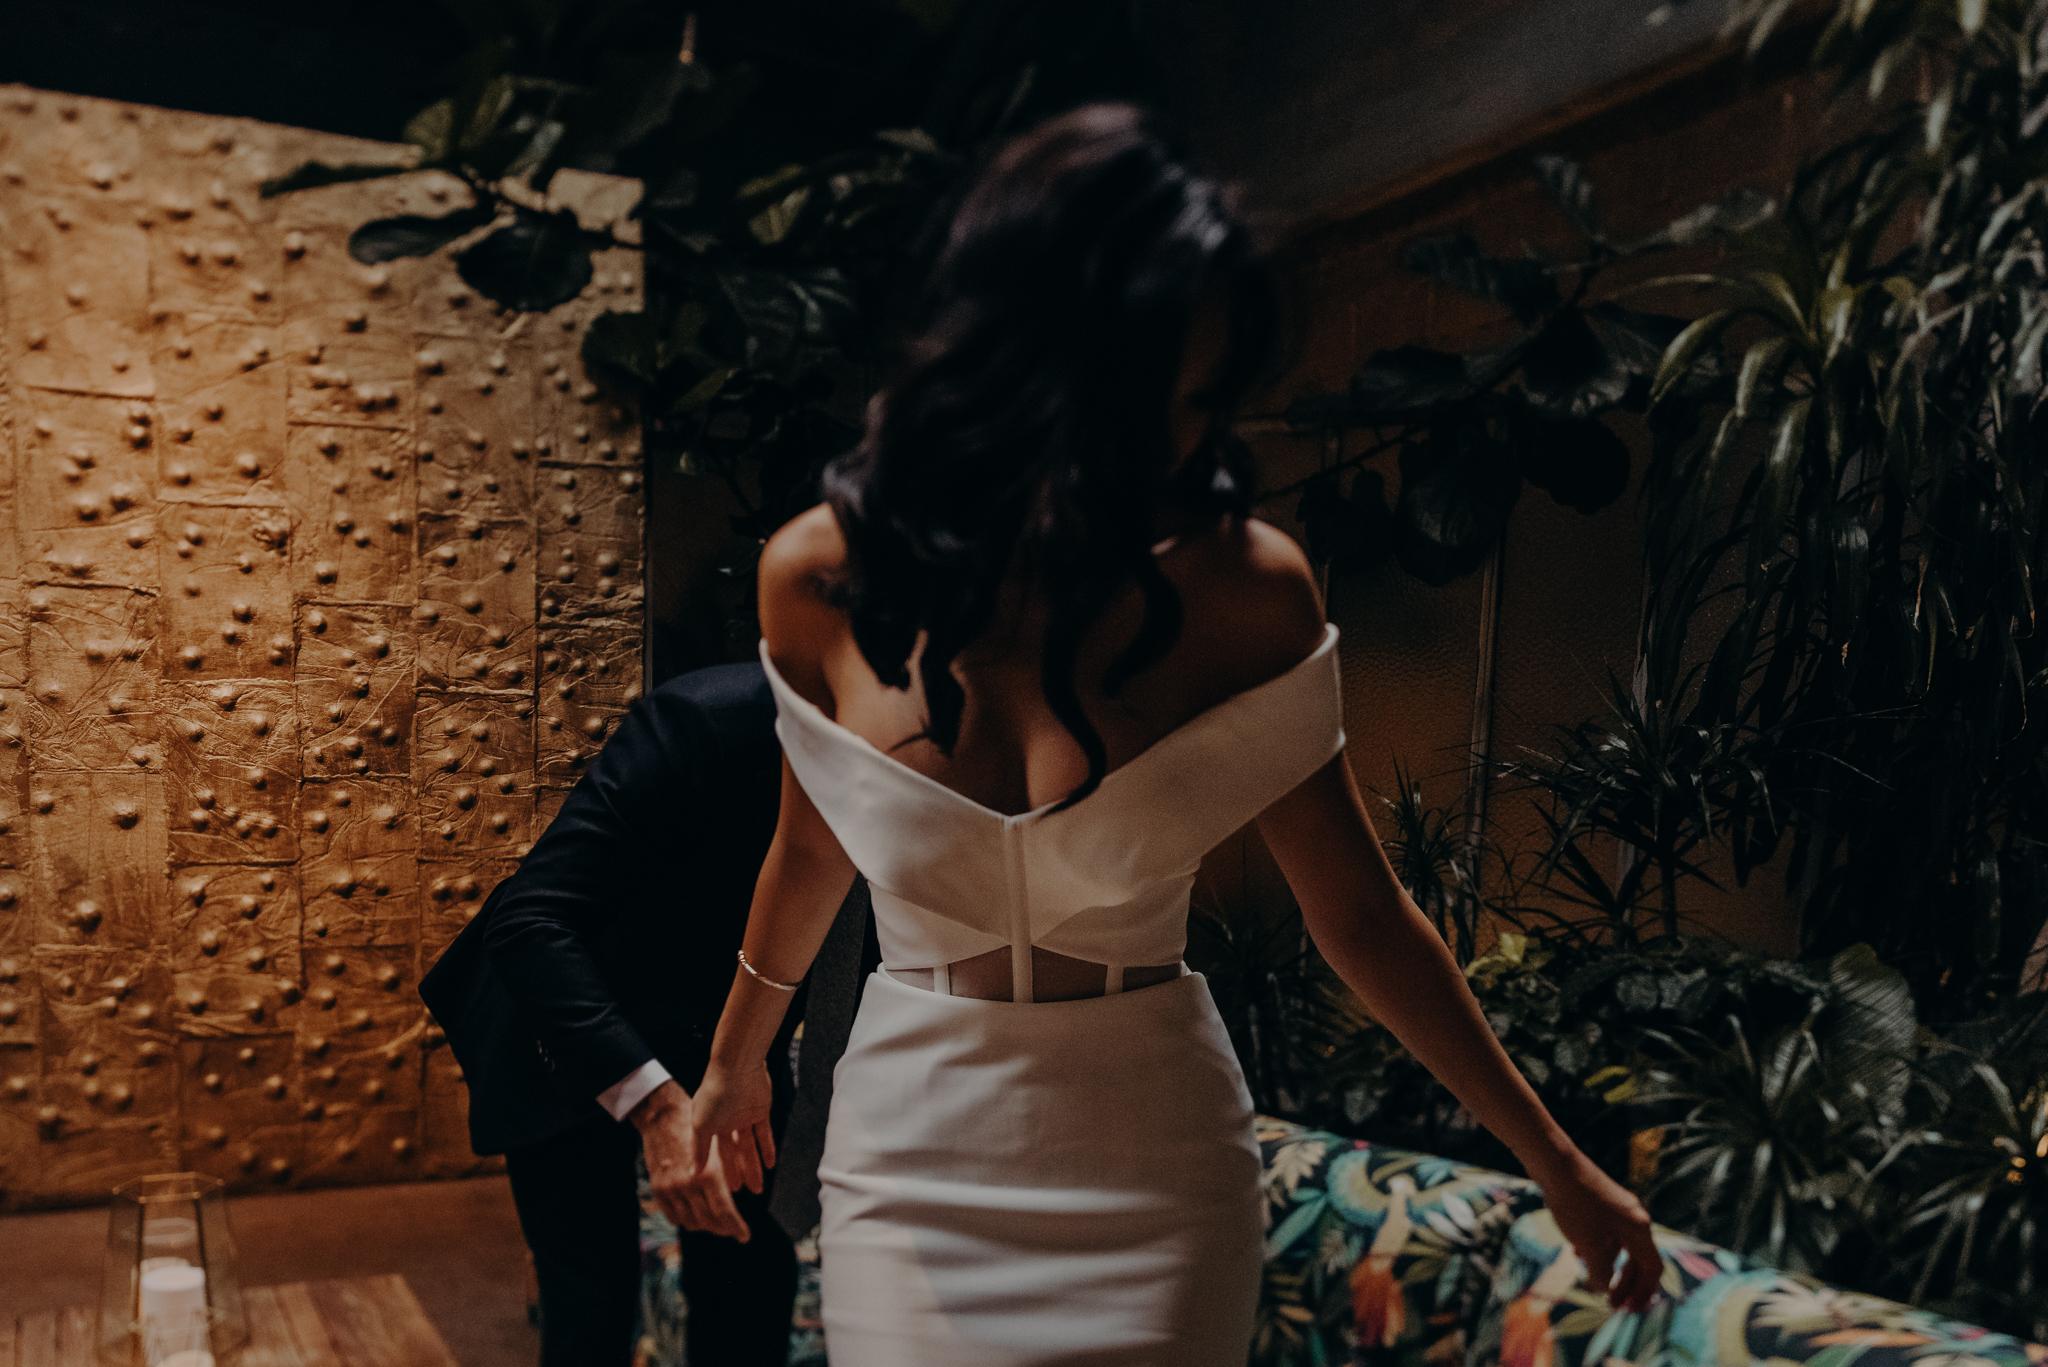 Wedding Photo LA - wedding photographer in los angeles - millwick wedding venue -isaiahandtaylor.com-041.jpg